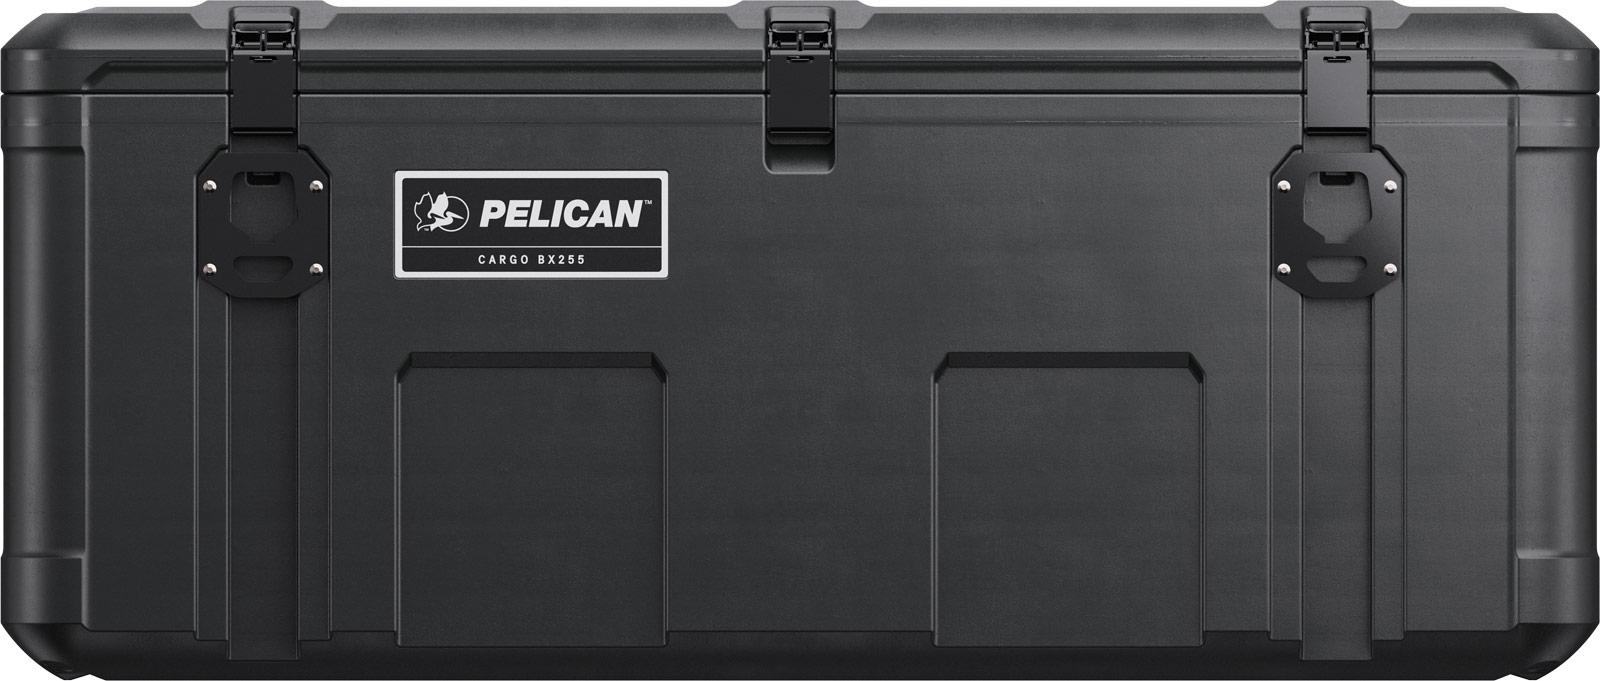 pelican cargo bx255 carrier case